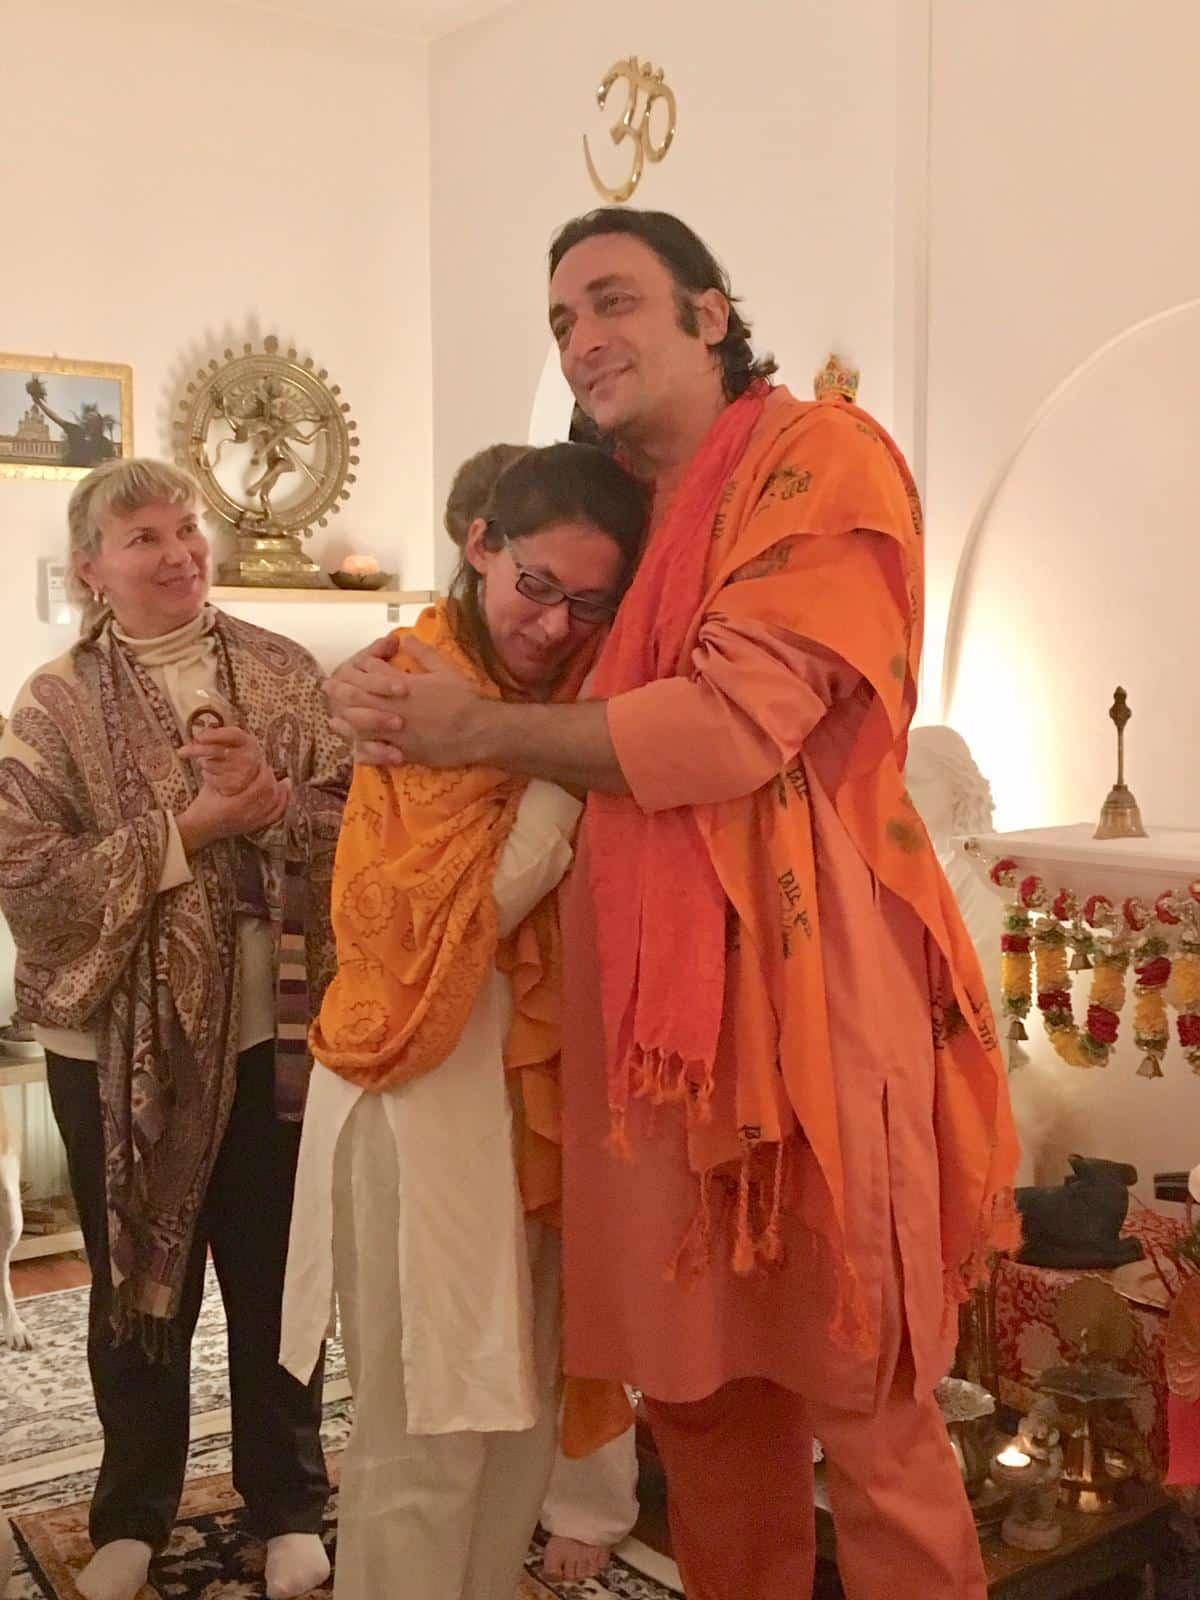 Davide R. Diesi (Swami) e allieva Caterina P. allo Shanti MahaMandir